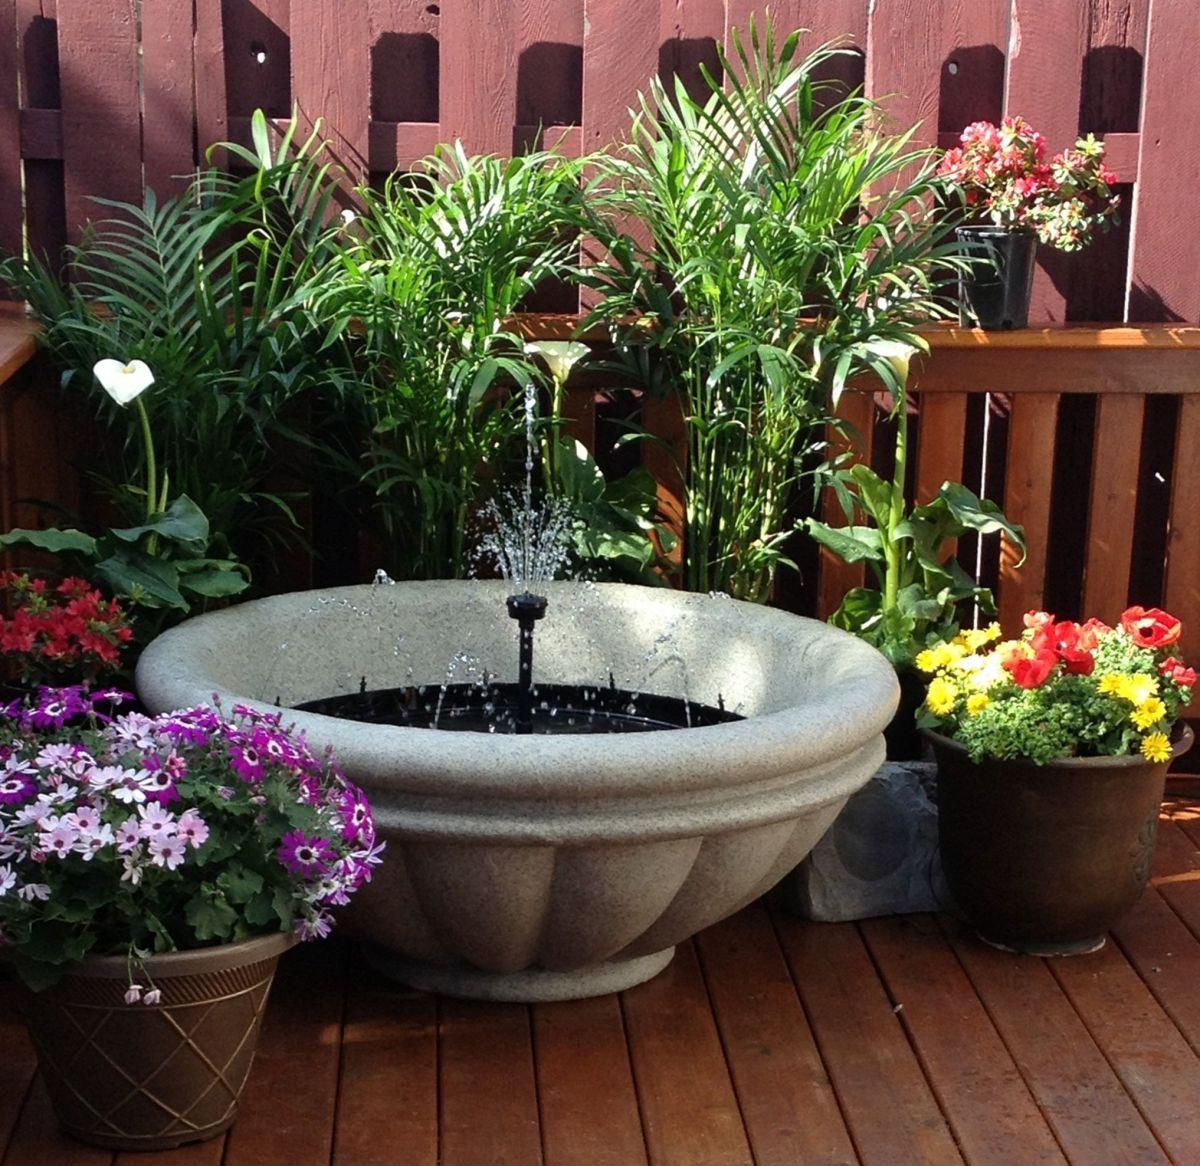 25 easy diy small backyard ideas for your home diy